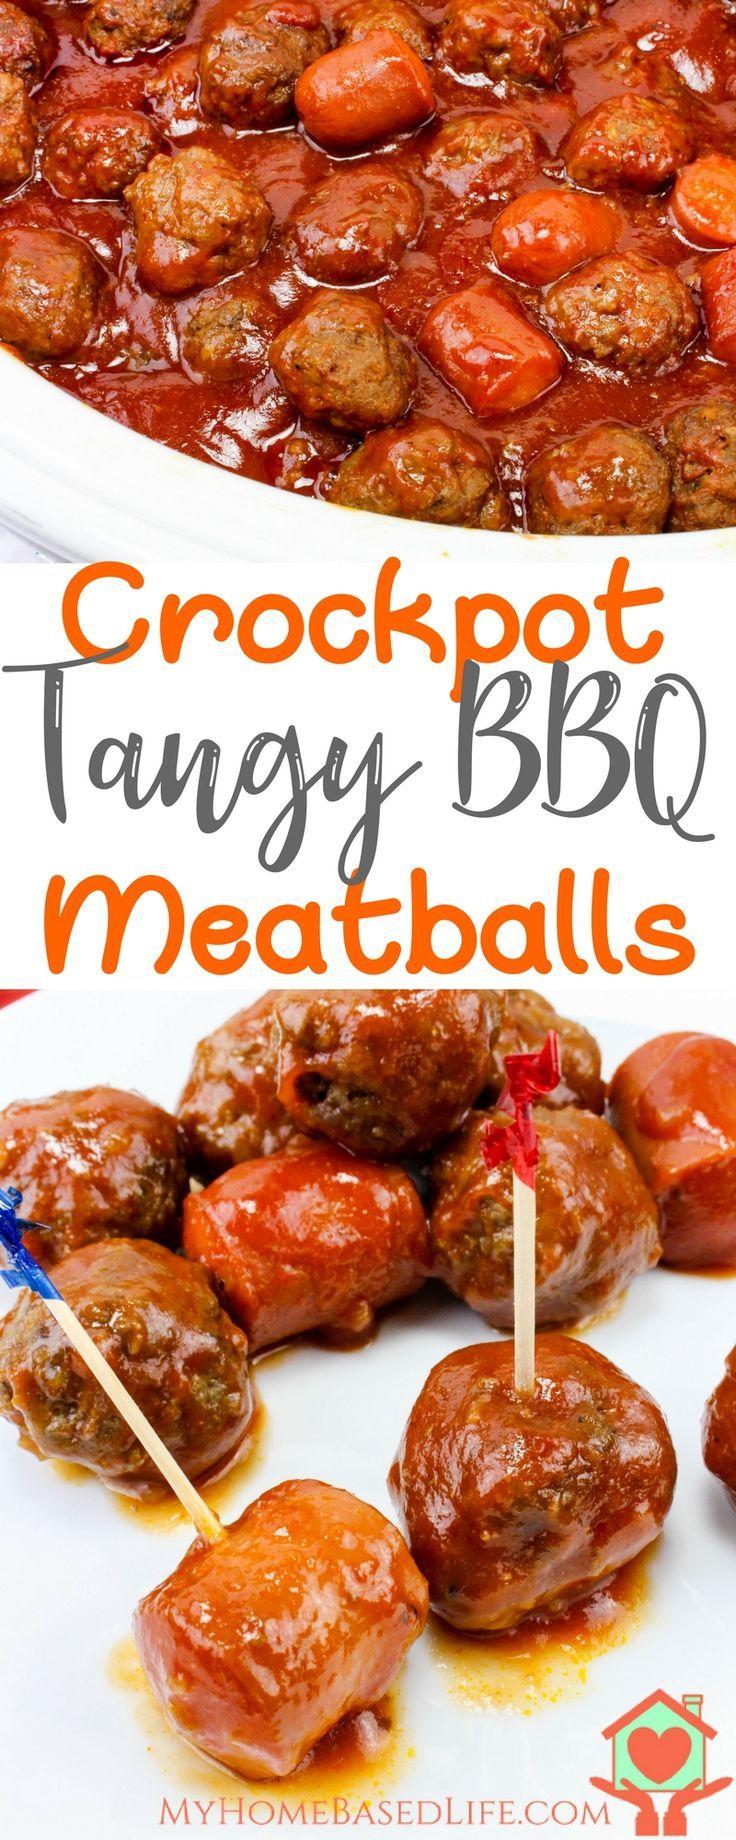 Crockpot Tangy BBQ Meatballs | Crockpot Recipe | Crockpot Meatballs | BBQ Meatball Recipe | Meatball Recipe | Easy Meatball Recipe | #meatballrecipe #crockpotmeals via @myhomebasedlife